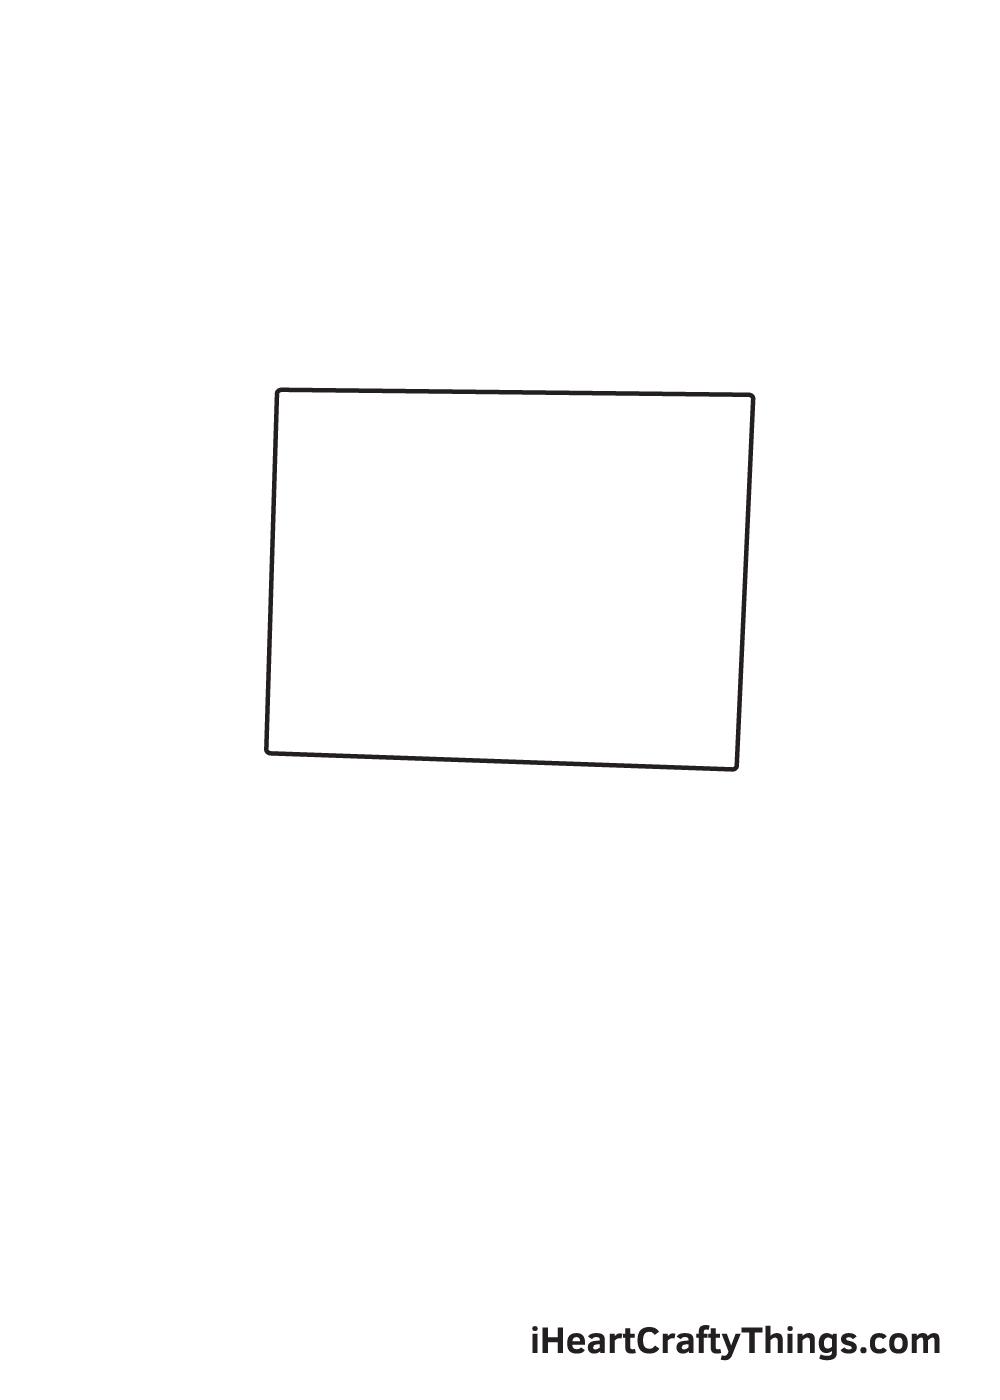 computer drawing - step 1